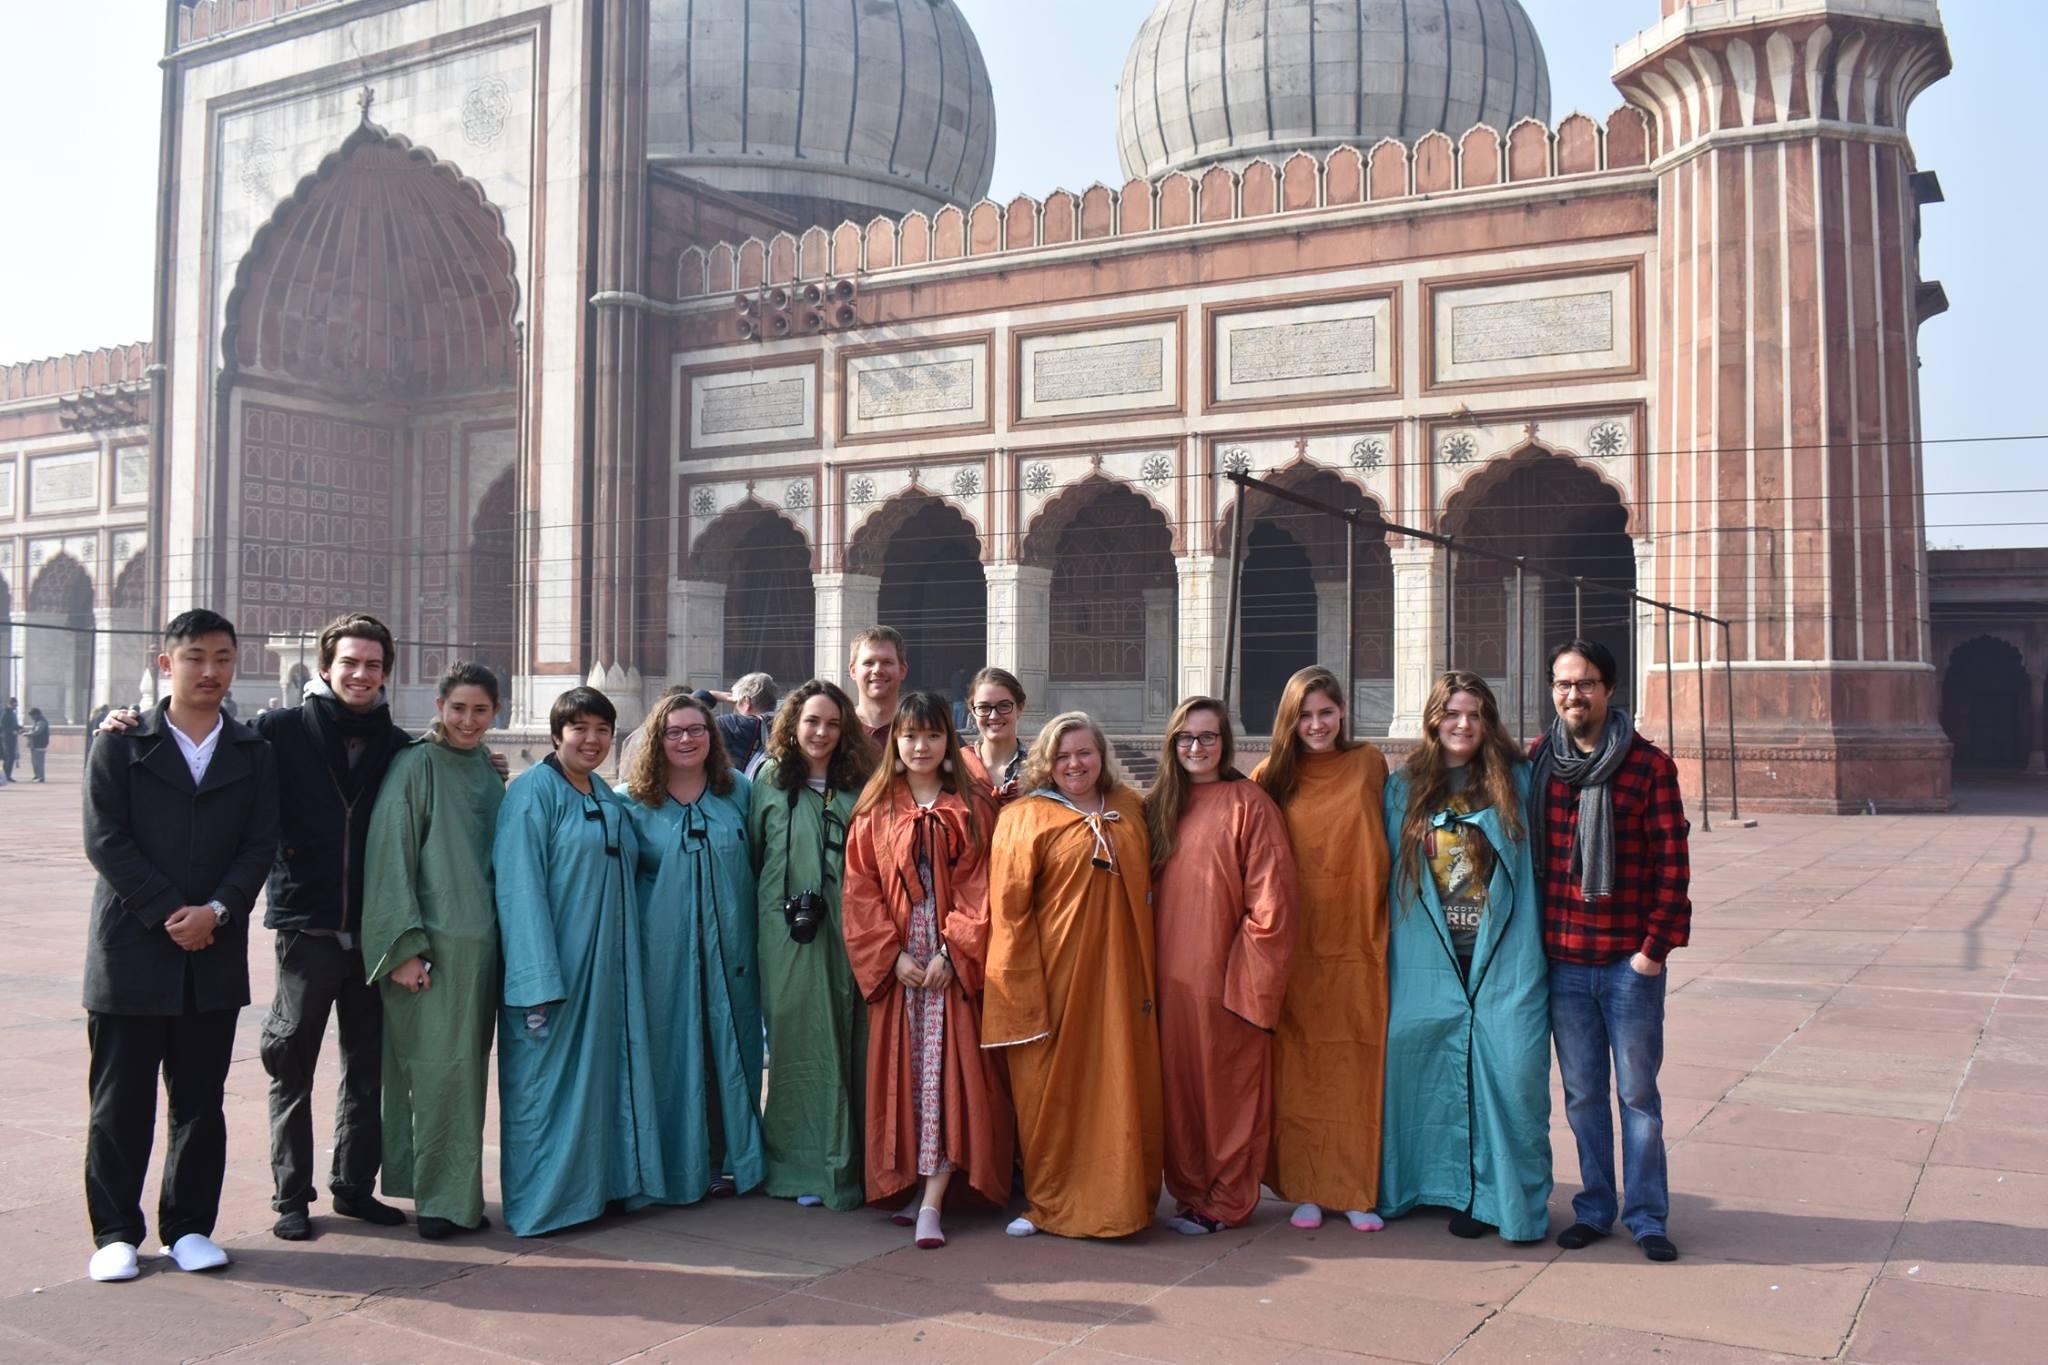 2018 seminar students at the Jama Masjid in Delhi, India  Photo provided by Dr. John Leupold, Associate Professor of Music